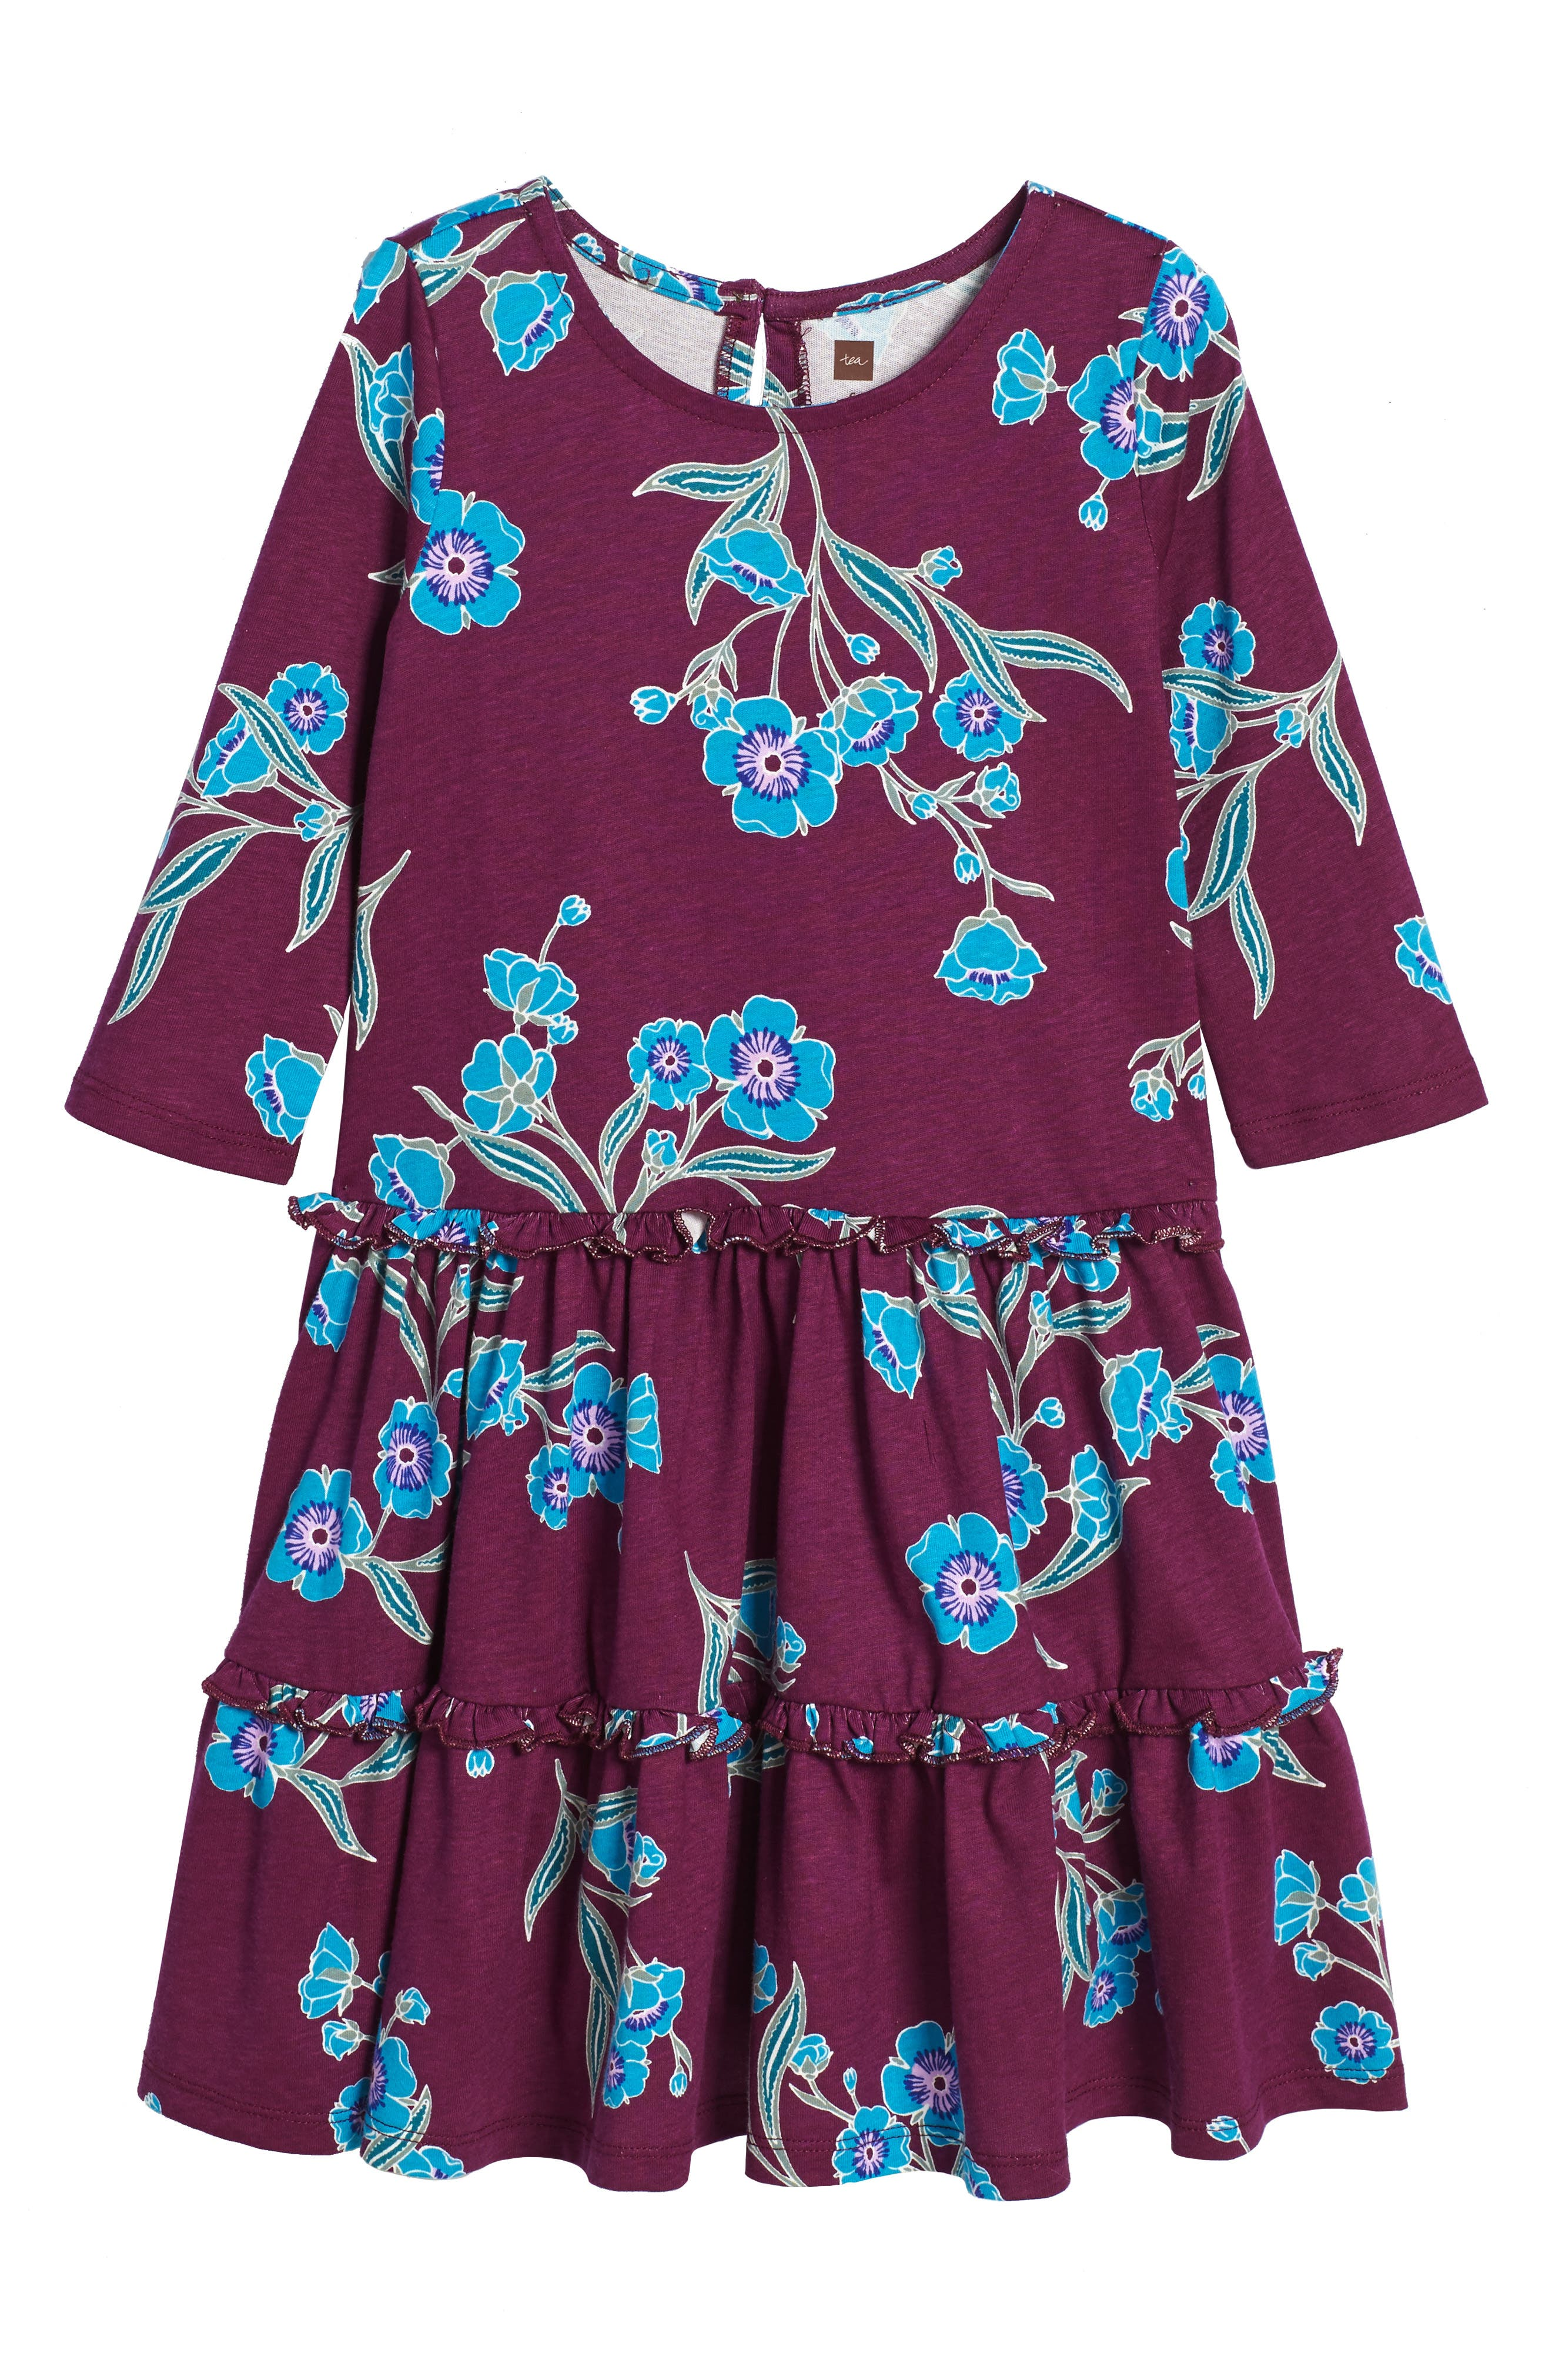 Marjorie Tiered Dress,                         Main,                         color, Cosmic Berry